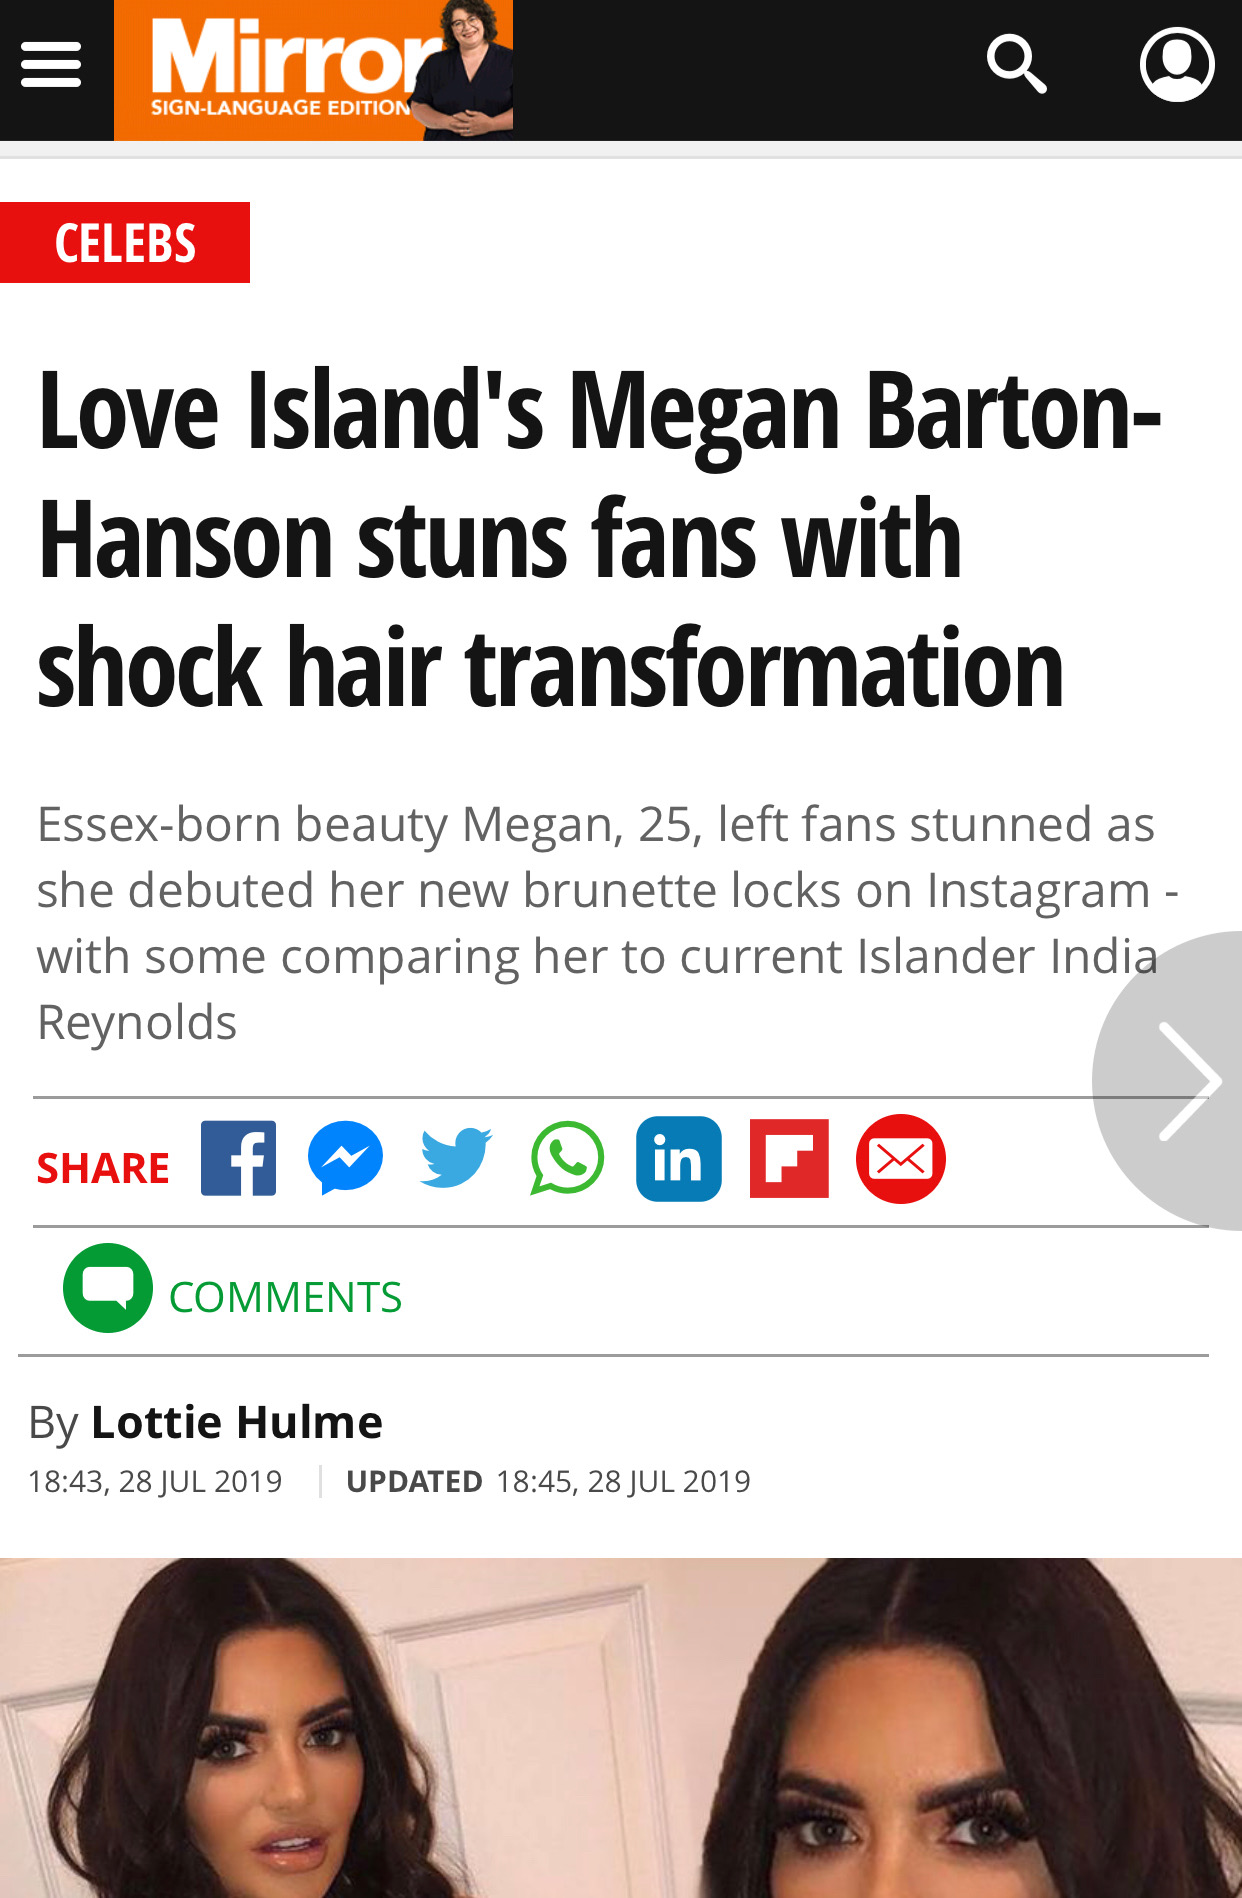 Love Island's Megan Barton-Hanson st